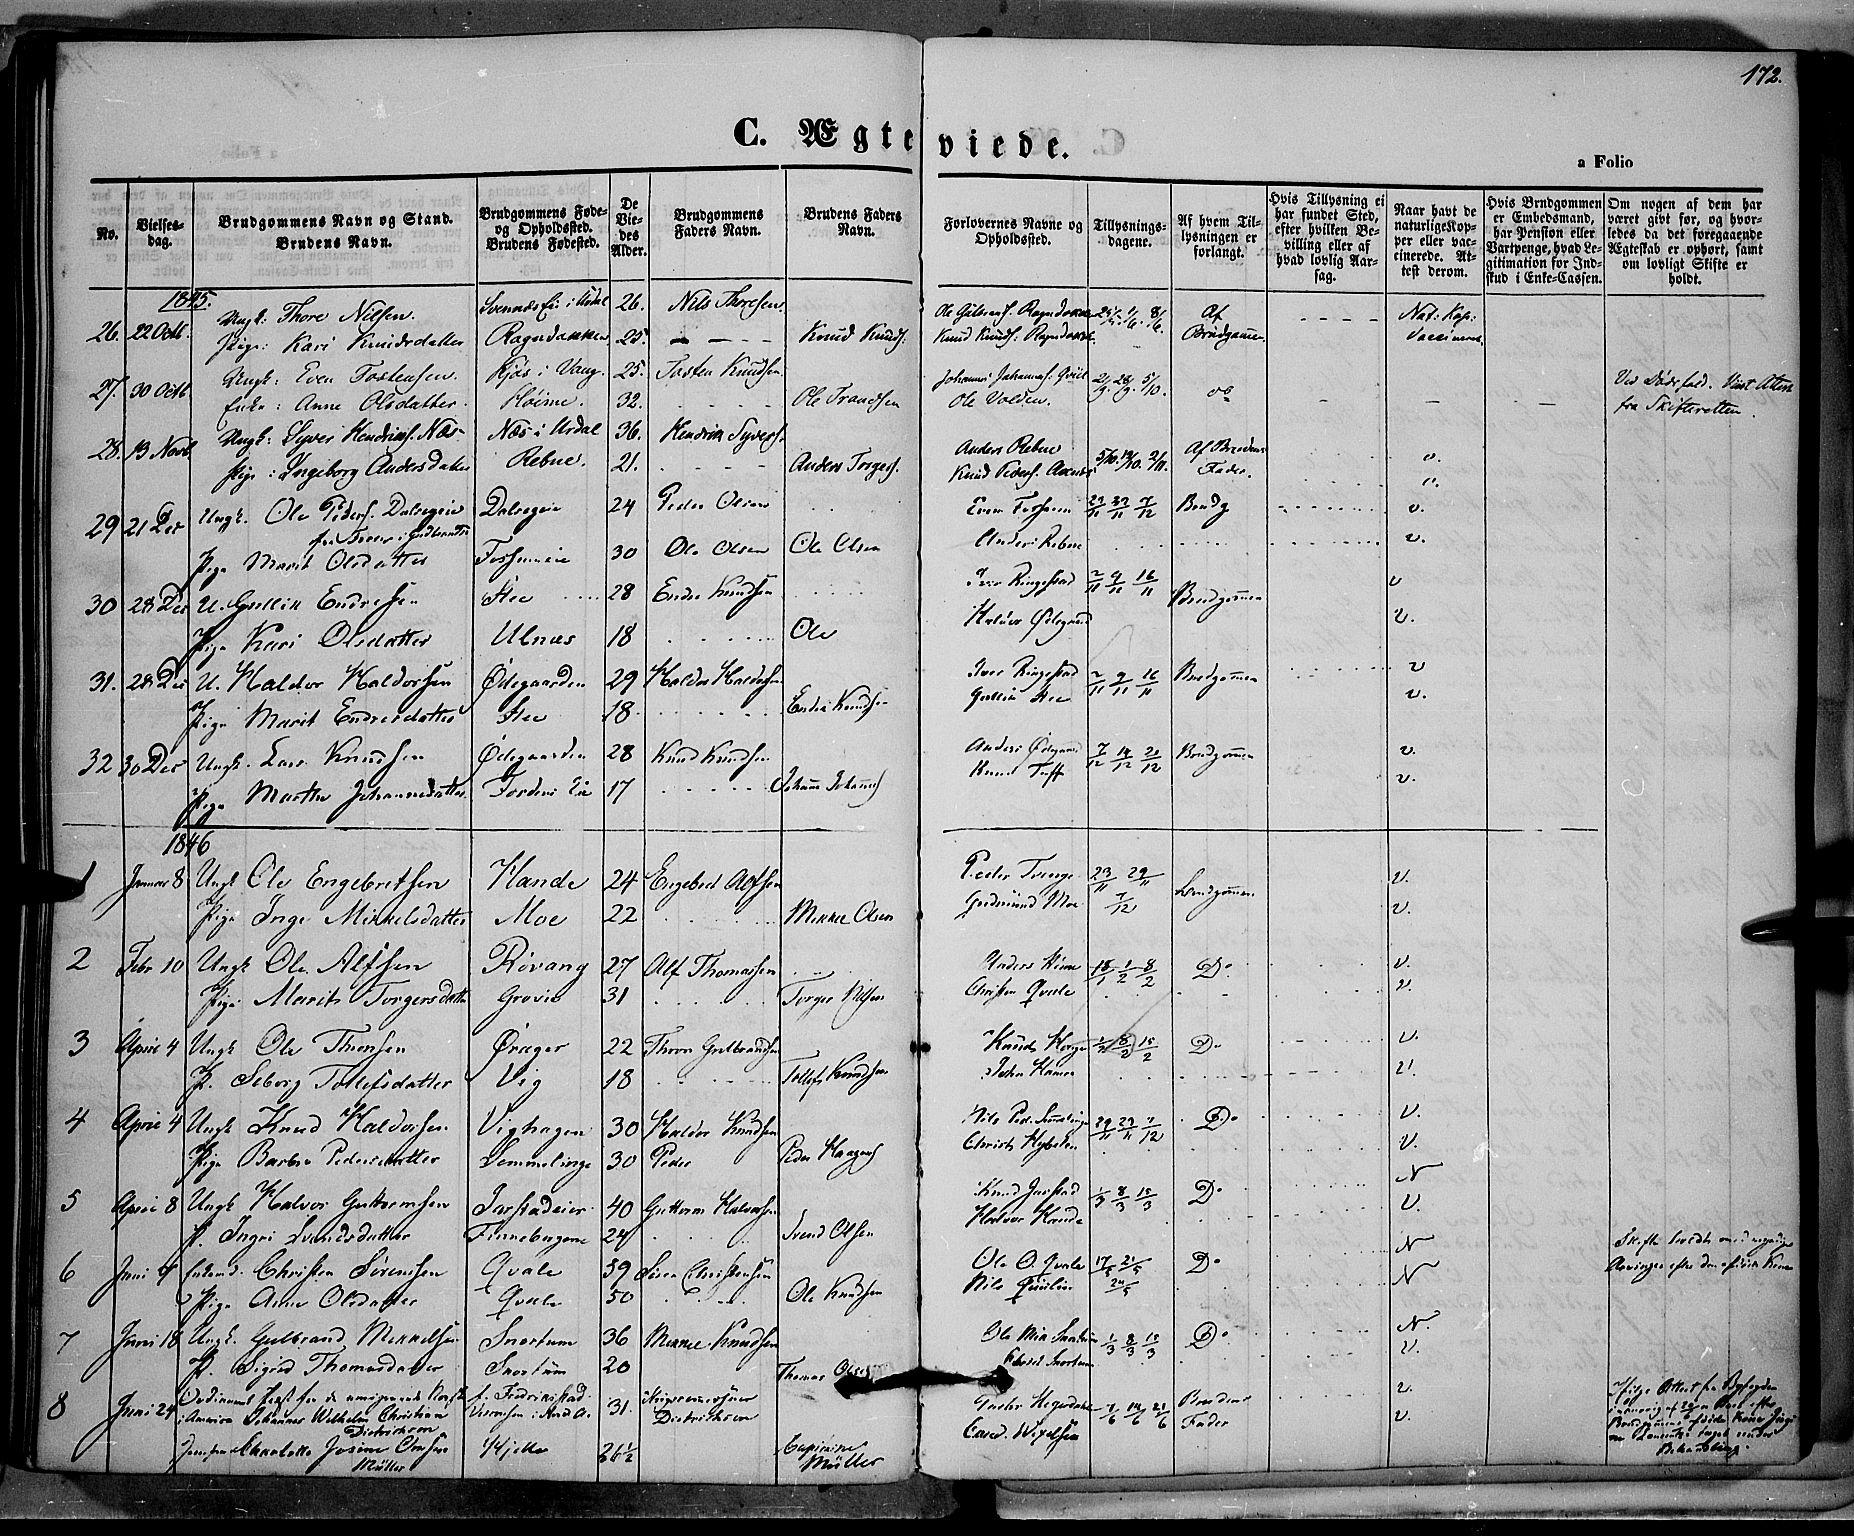 SAH, Vestre Slidre prestekontor, Ministerialbok nr. 1, 1844-1855, s. 172